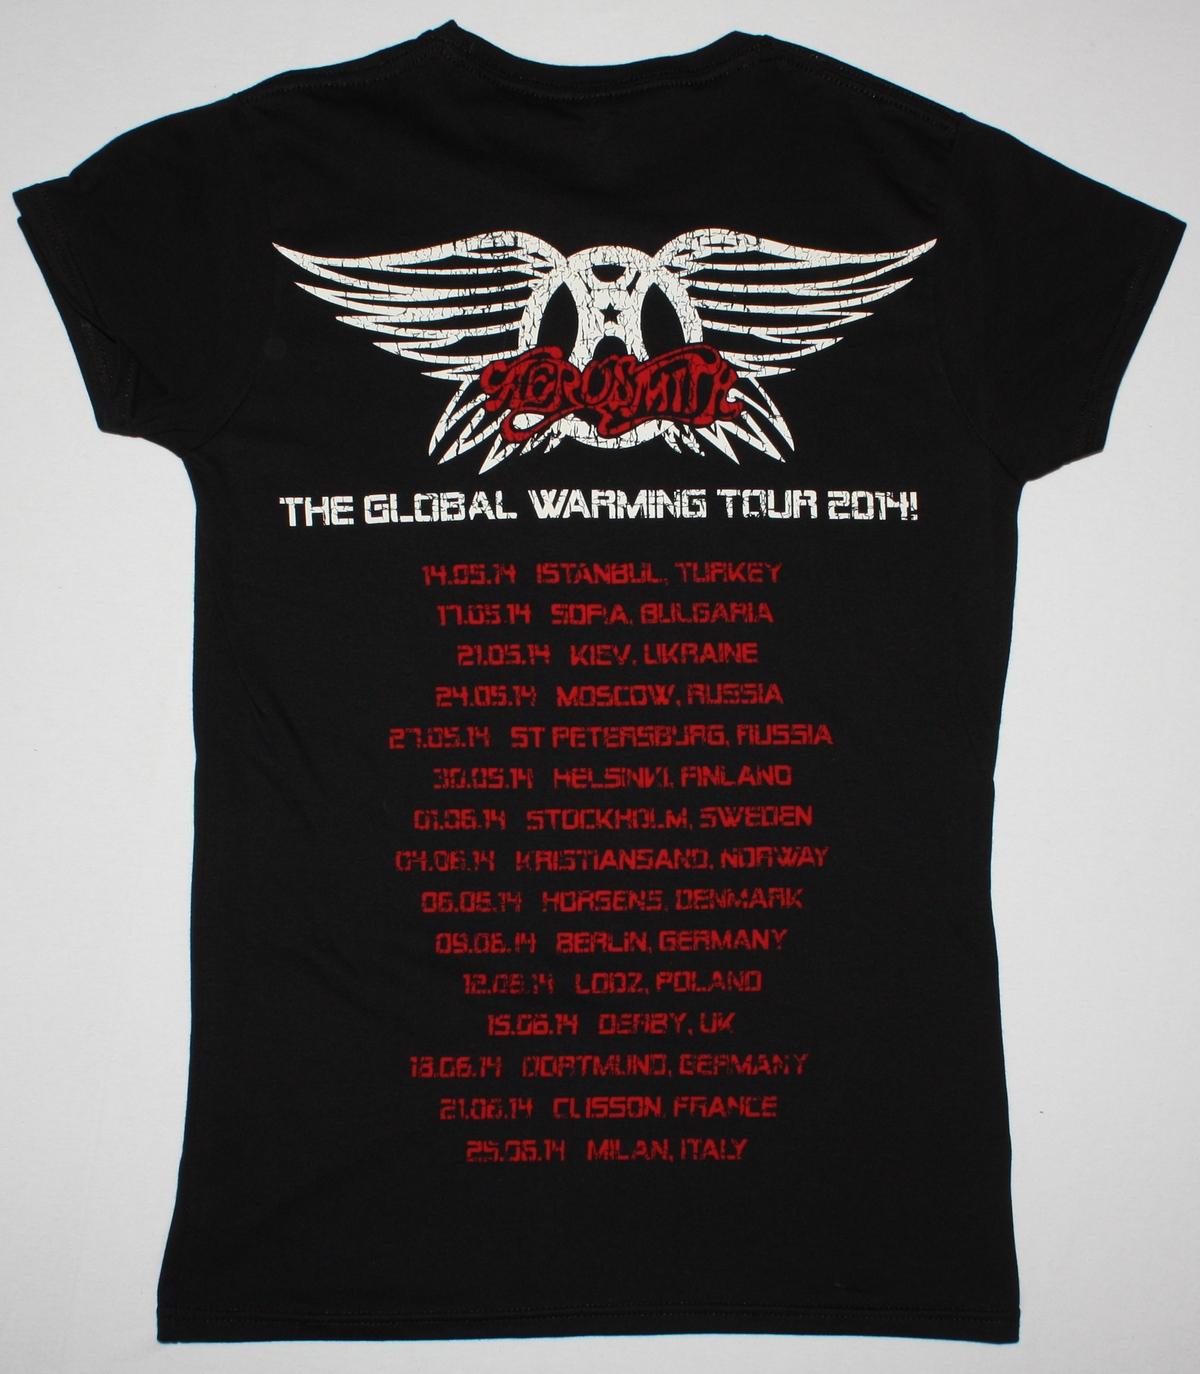 AEROSMITH AEROFORCE ONE TOUR DATES 2014 NEW BLACK LADY T-SHIRT